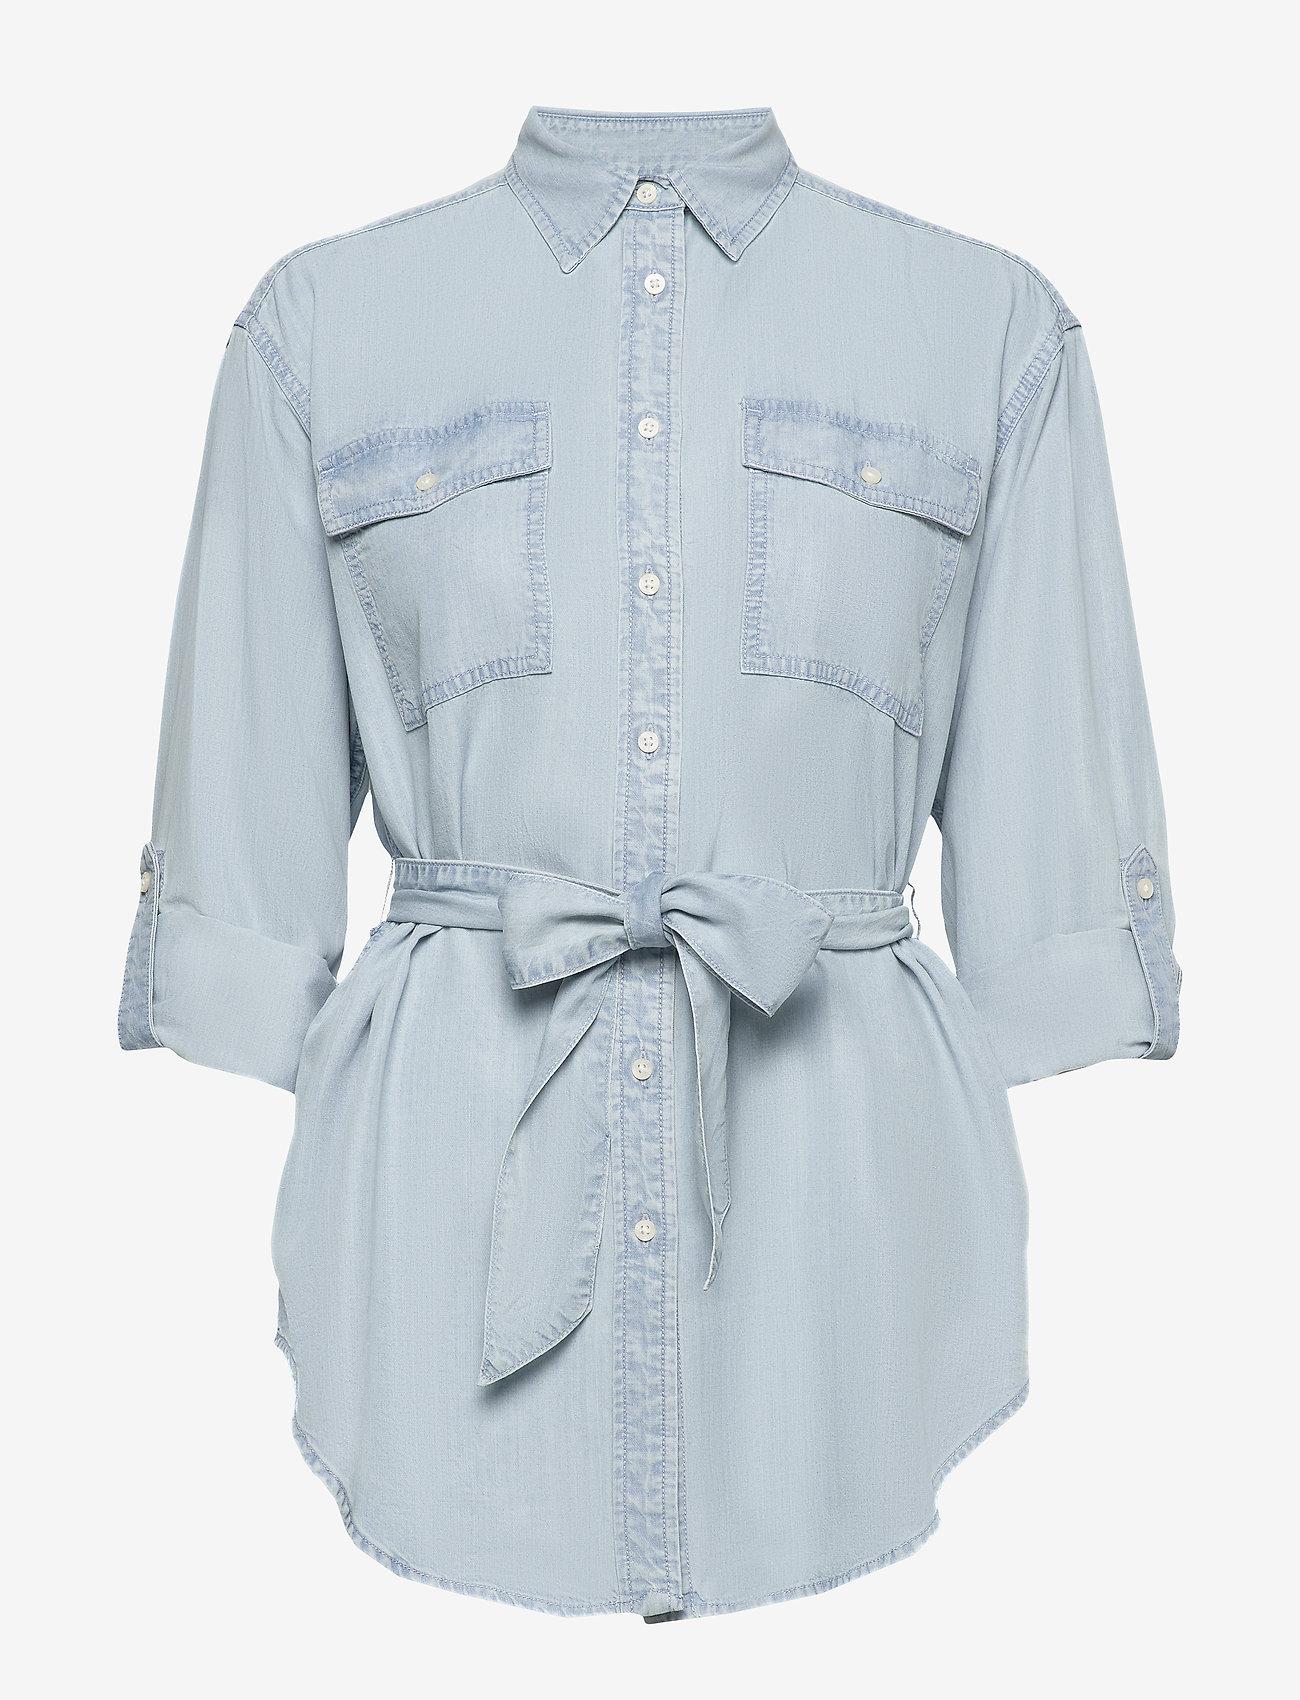 Belted Shirt (Pale Blue Wash) - Lauren Ralph Lauren N4IBU5